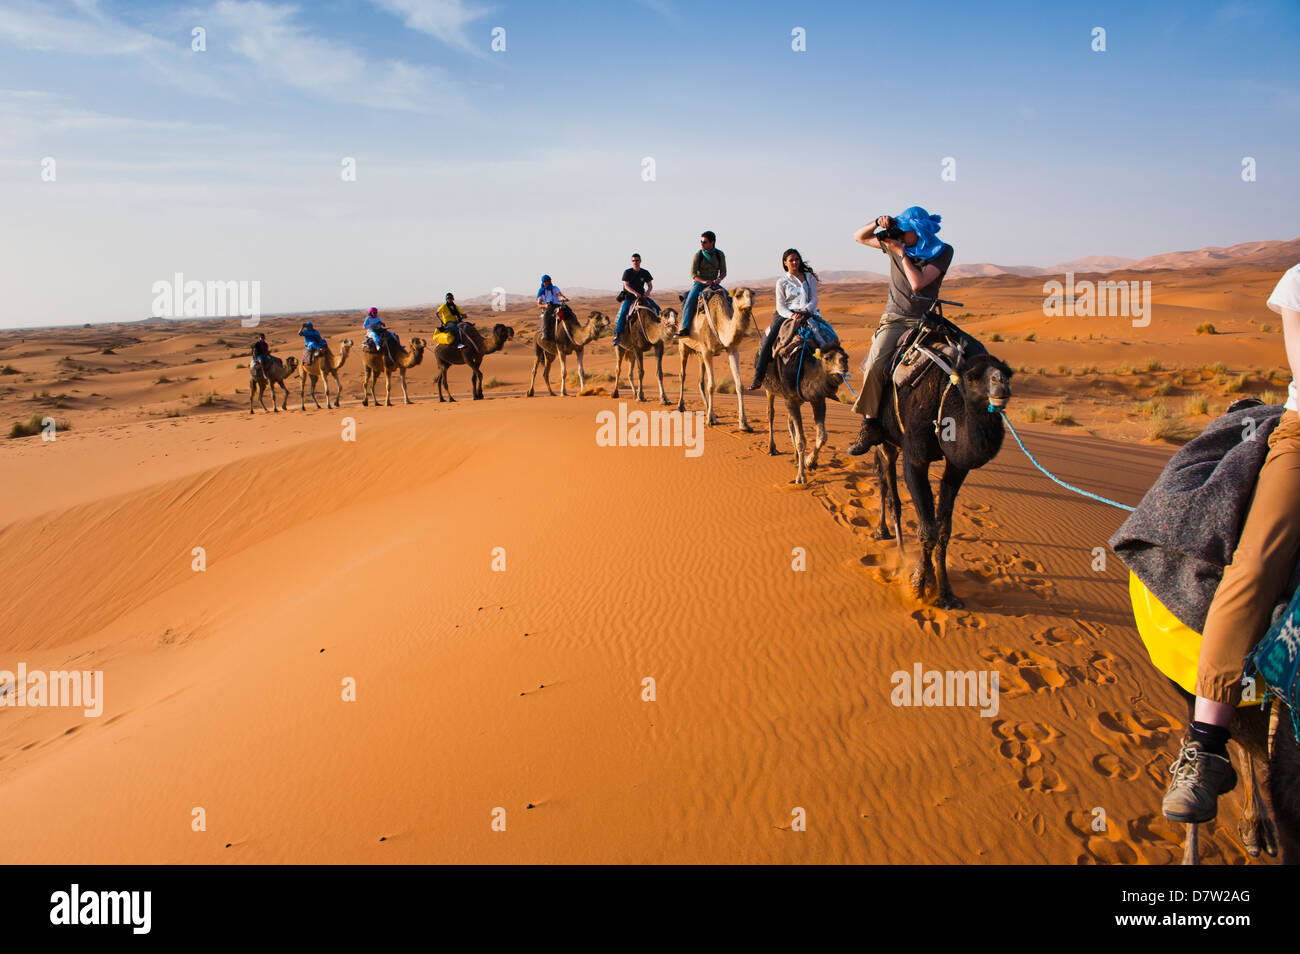 Tourists on a camel ride in Erg Chebbi Desert, Sahara Desert near Merzouga, Morocco, North Africa Stock Photo